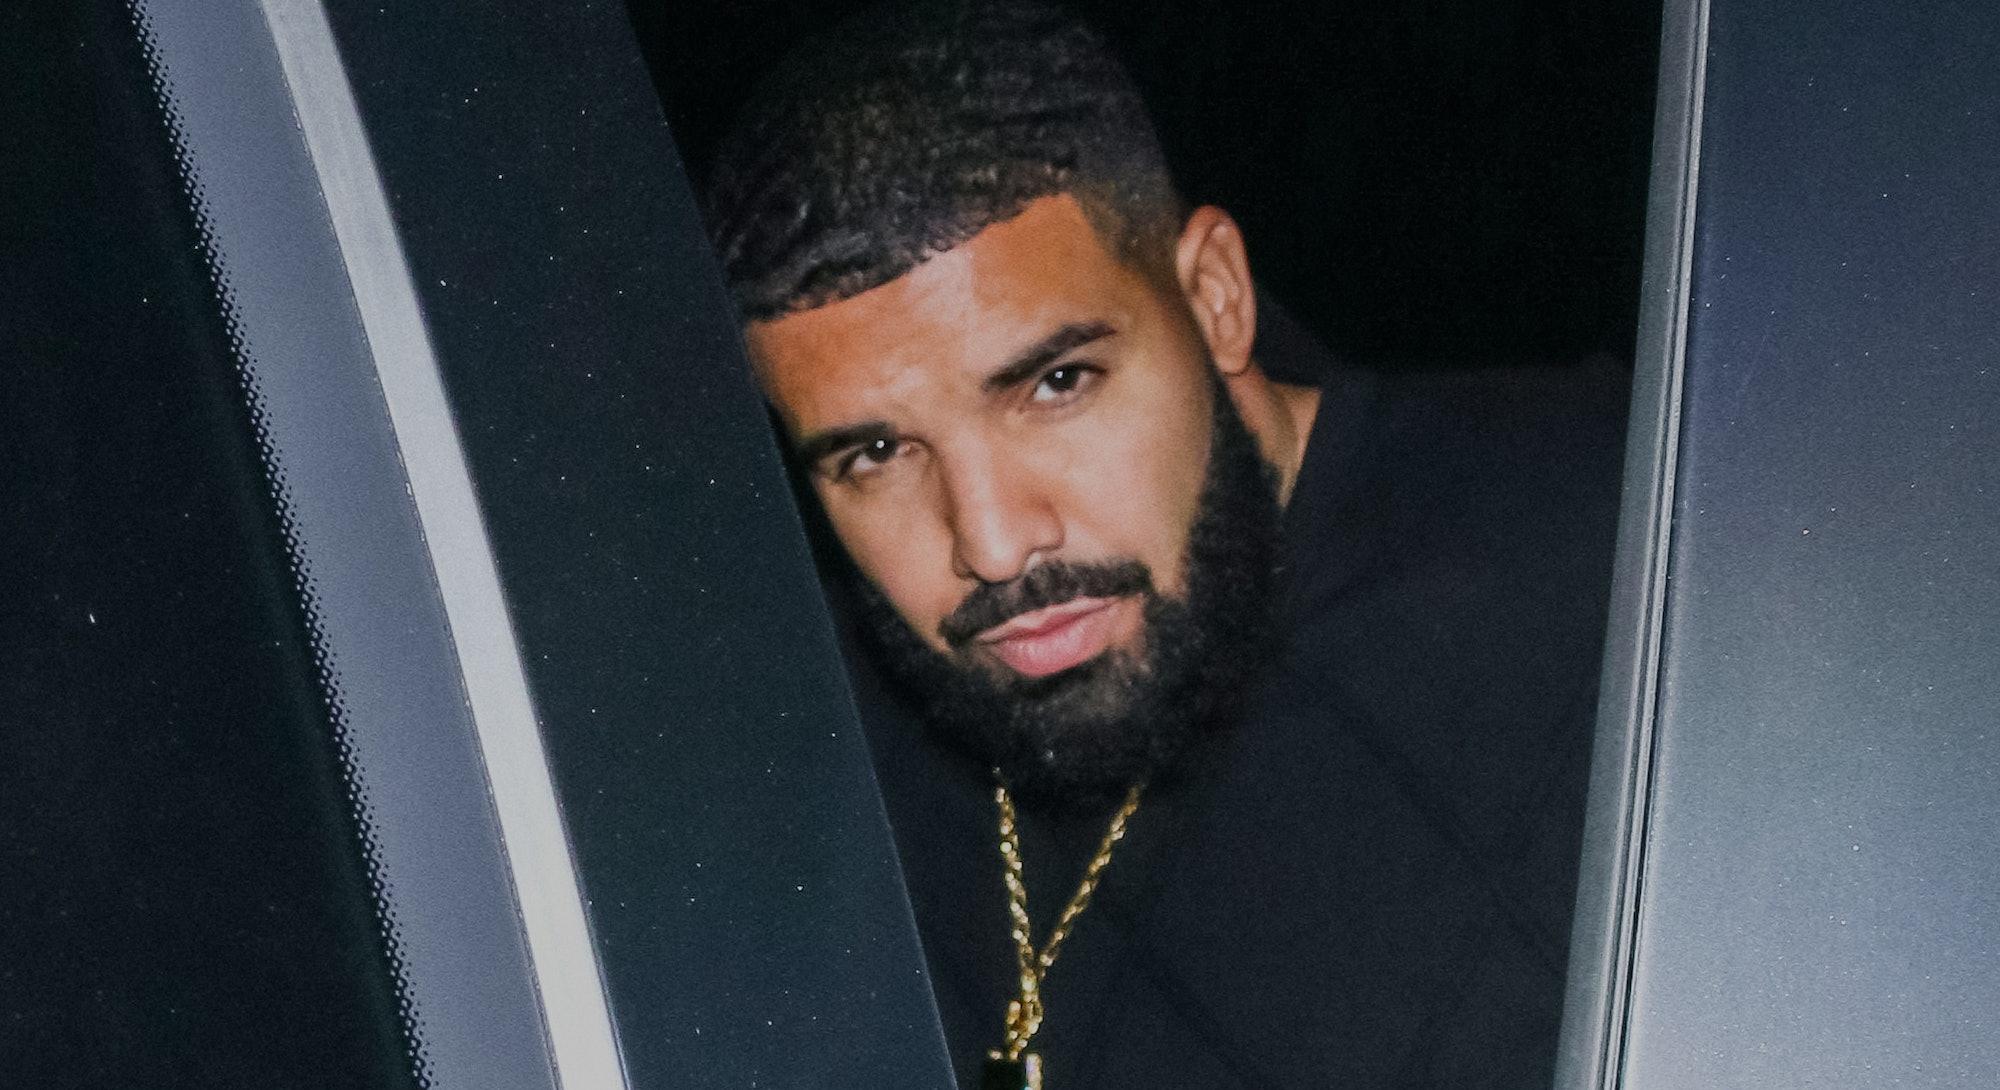 LOS ANGELES, CA - SEPTEMBER 21: Drake is seen on September 21, 2019 in Los Angeles, California.  (Ph...